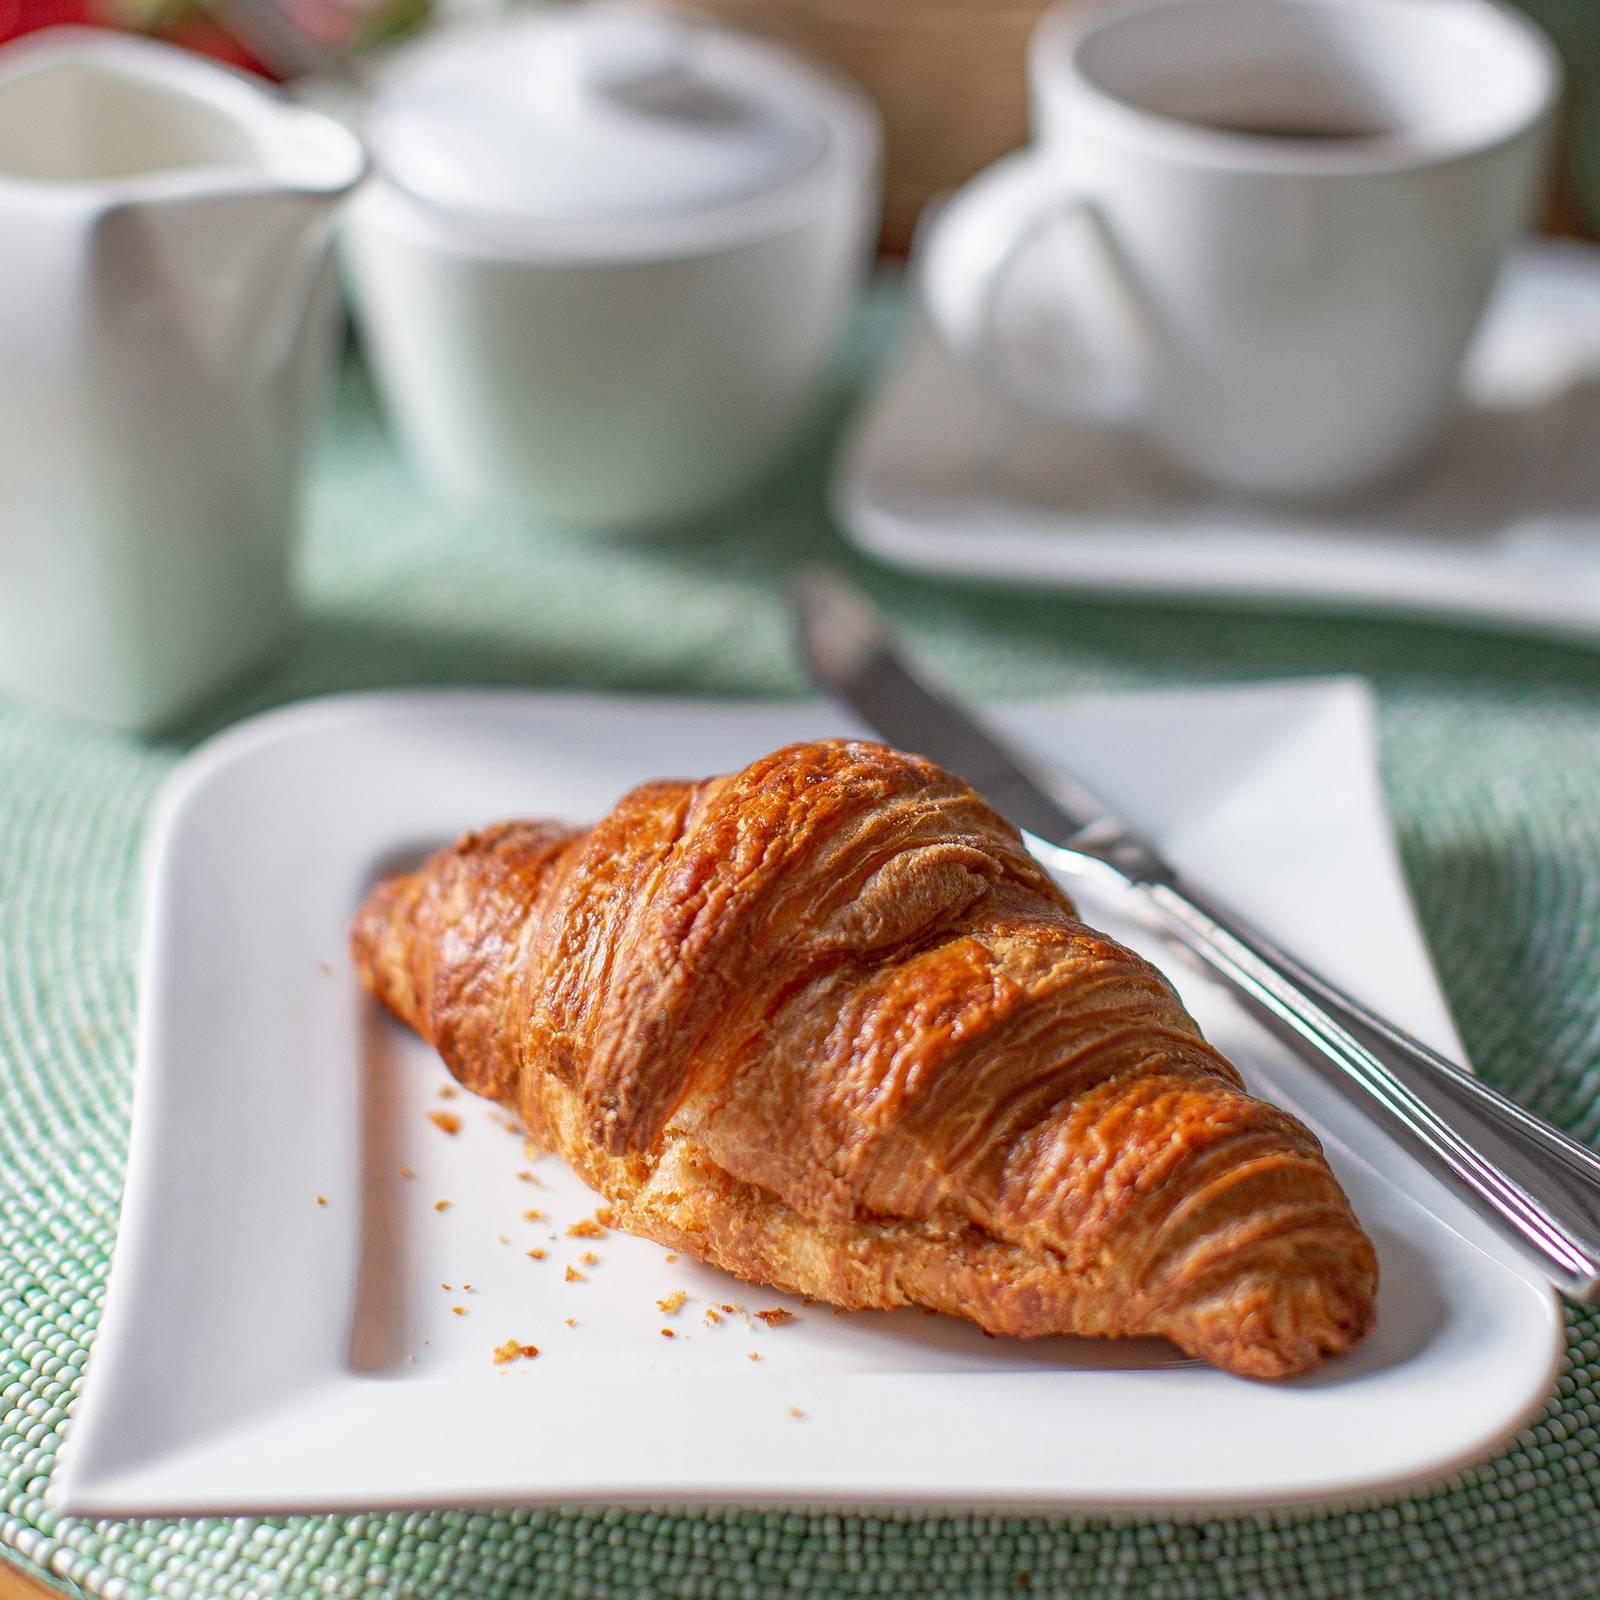 Kaffeeservice Welle 29-Tlg.  AMBITION